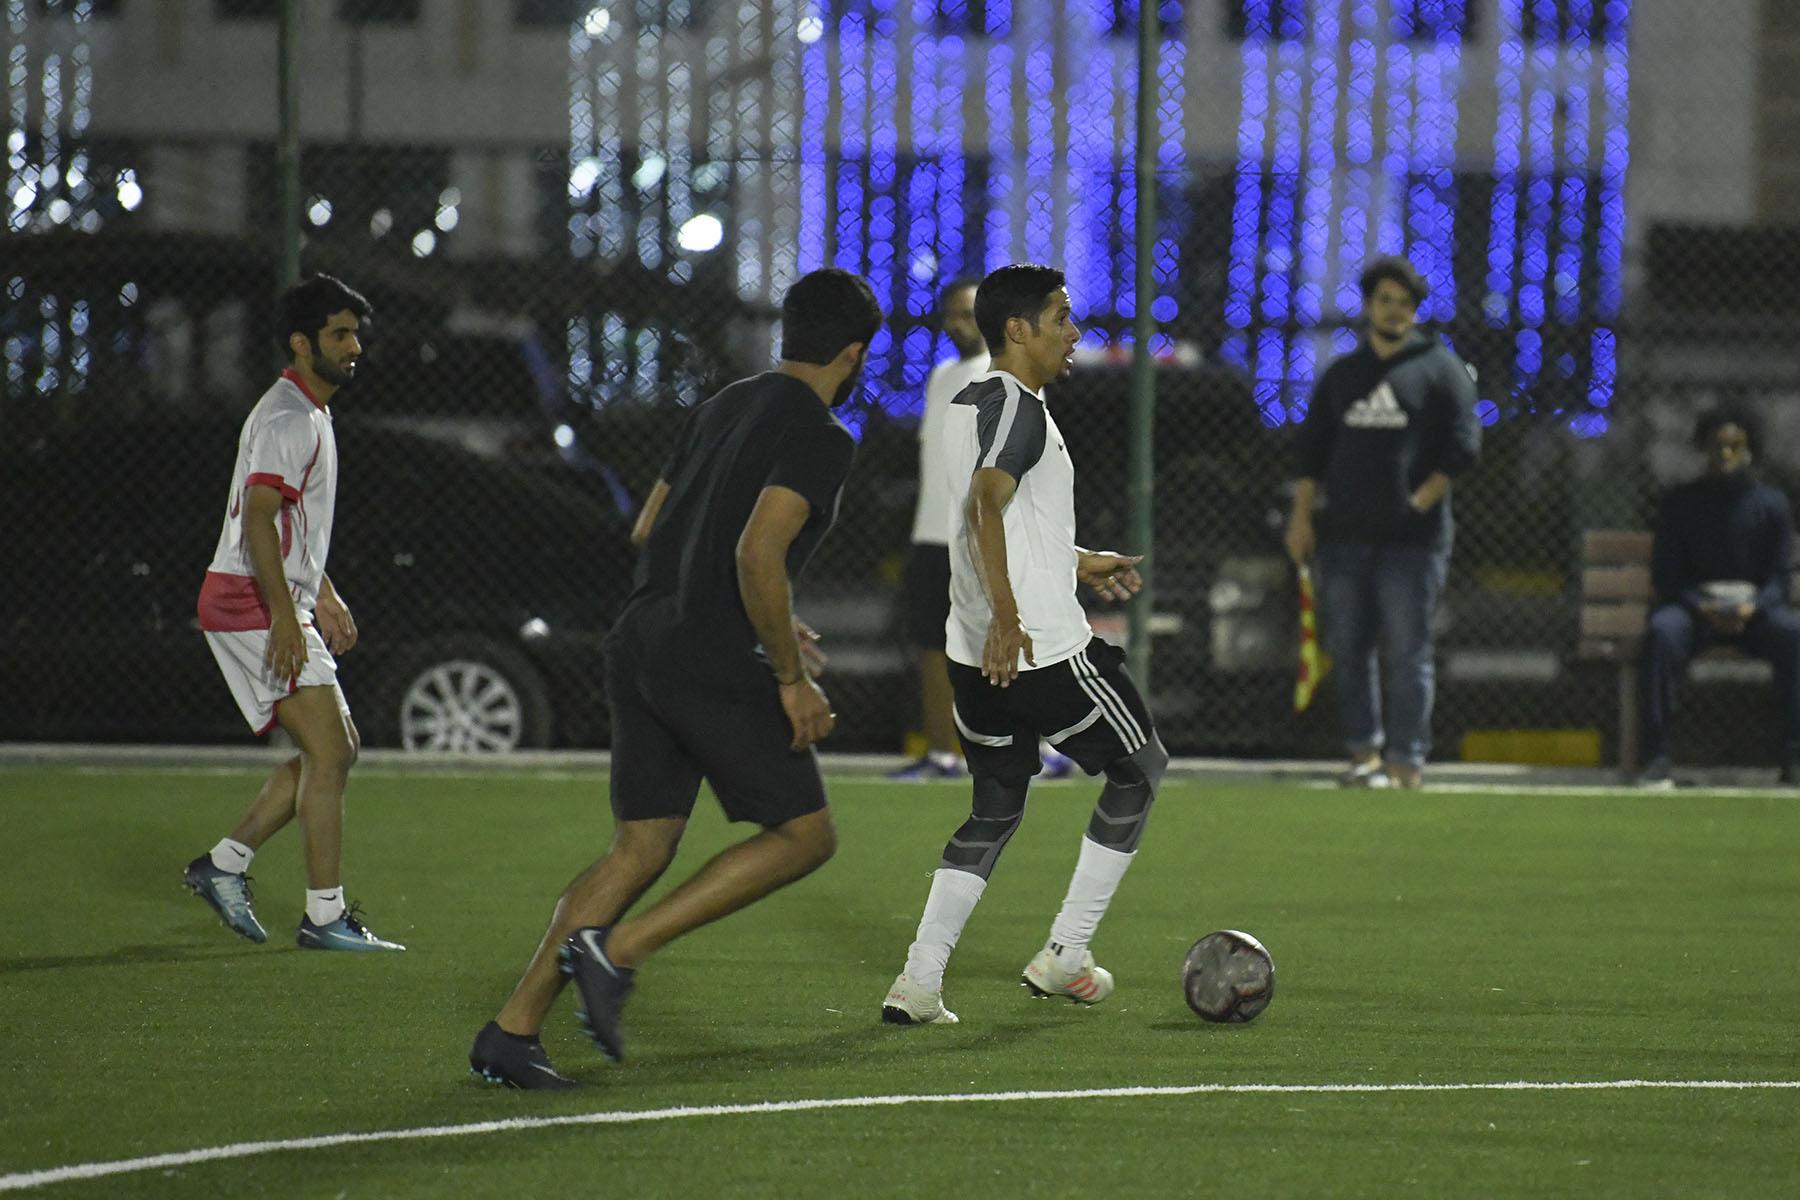 Real Madrid vs Law Students - Semi Final